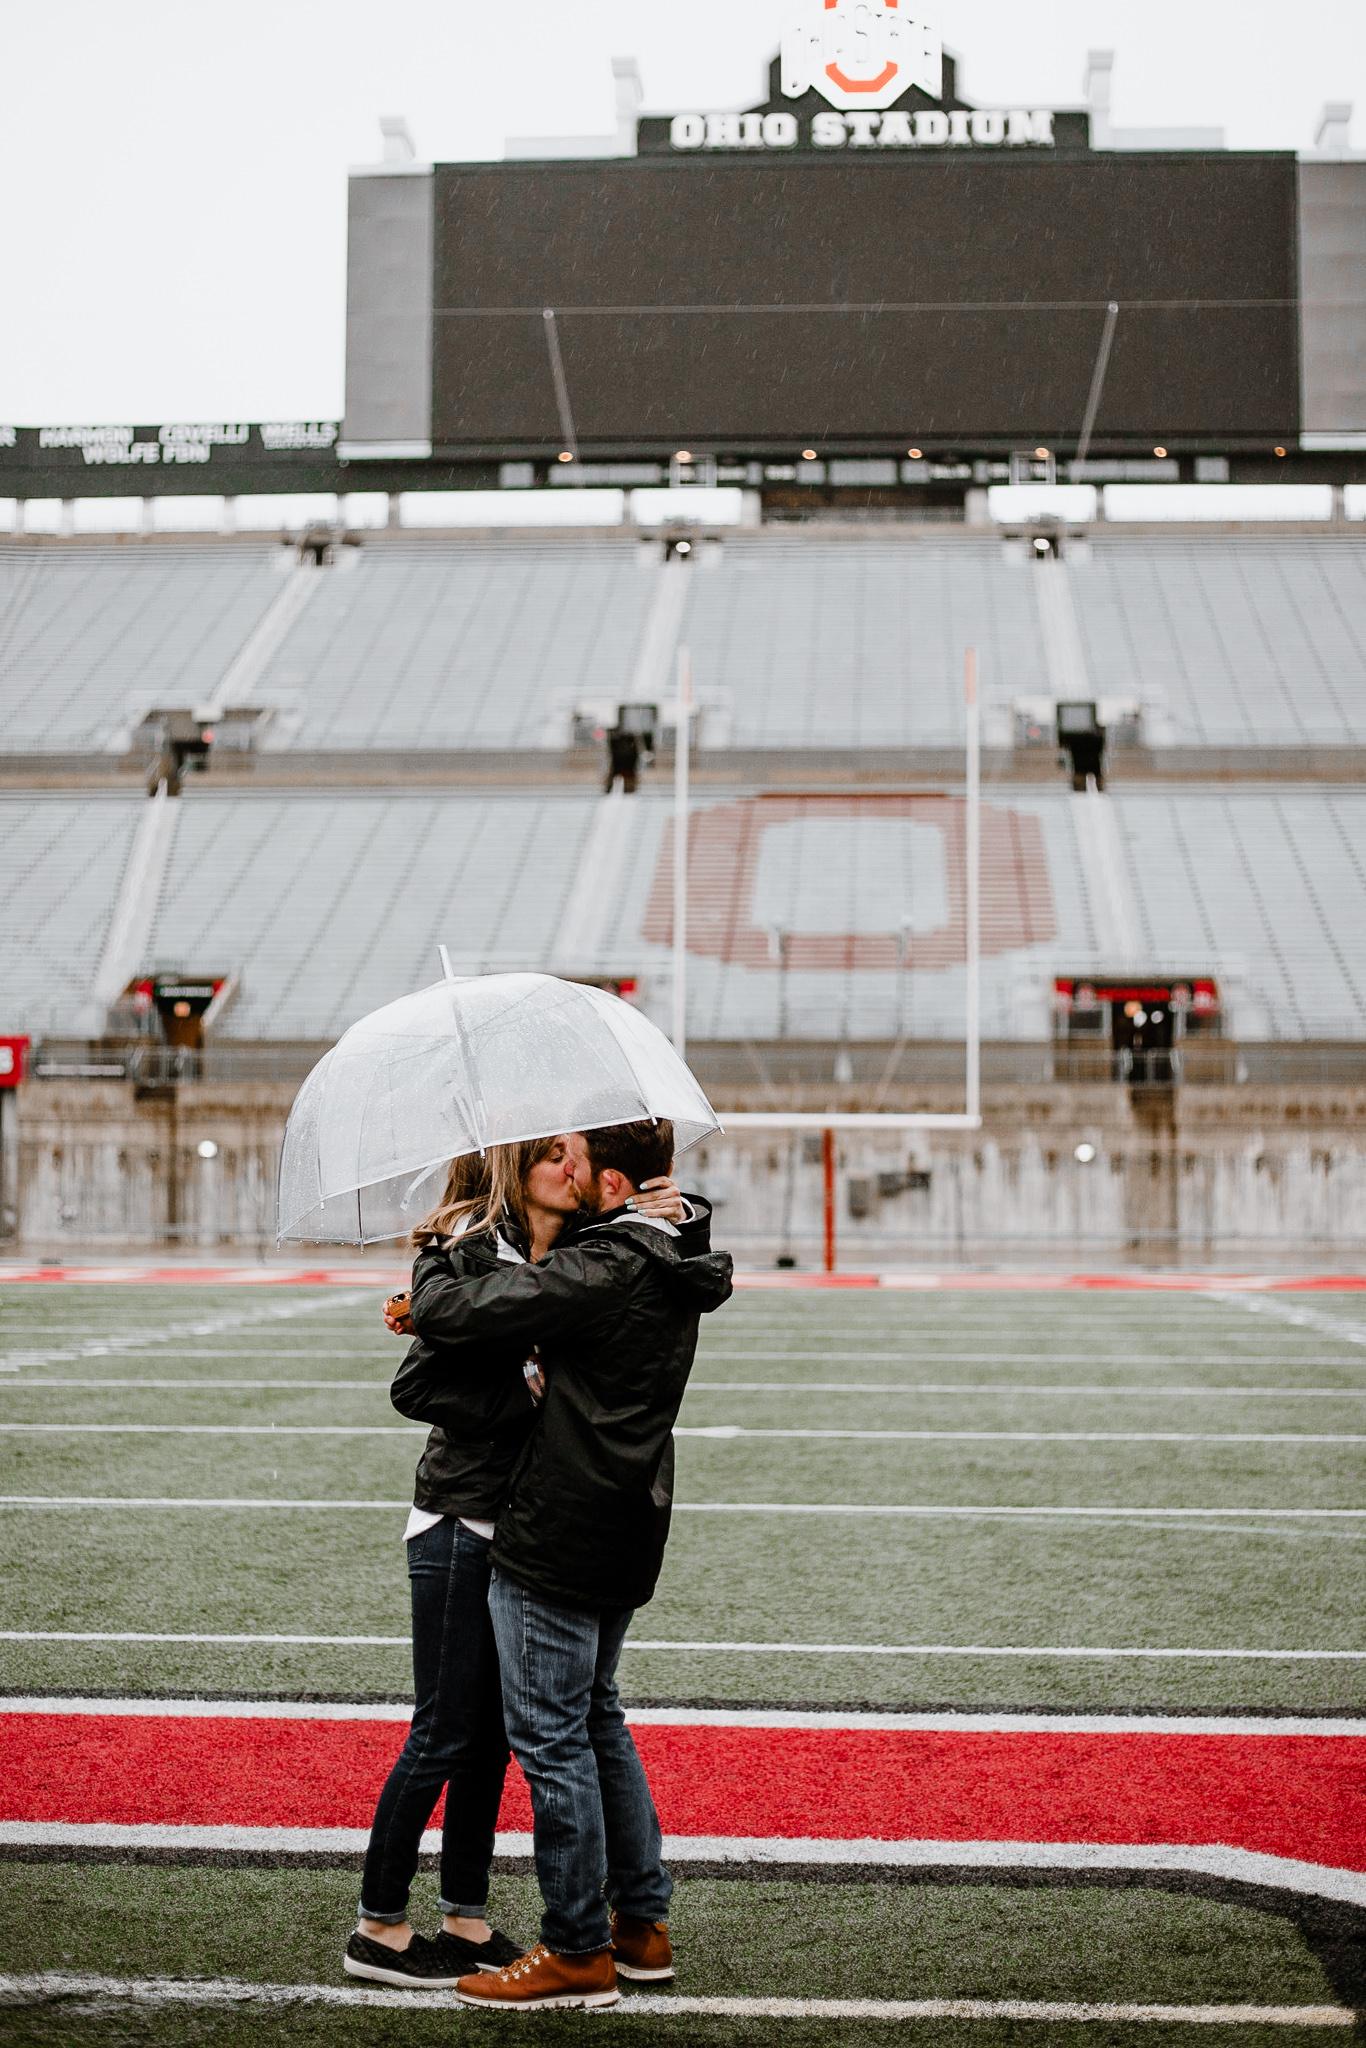 Jill + Cory   Ohio State Football Stadium Surprise Proposal   Catherine Milliron Photography   Ohio Wedding + Engagement Photographer